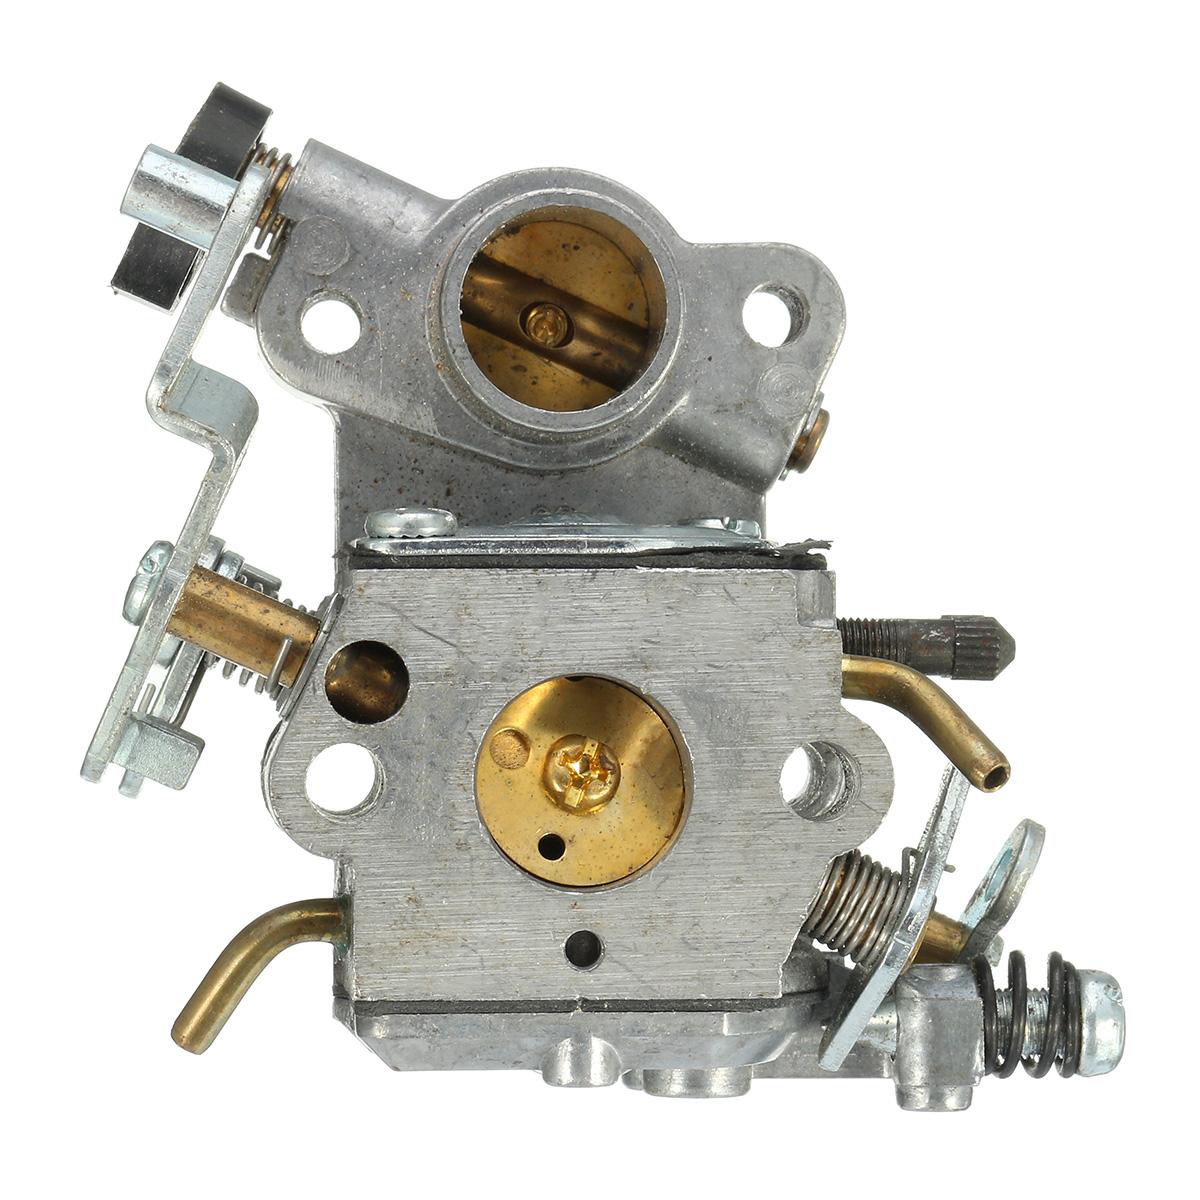 Carburetor Carb For Chainsaw Poulan P3314 P3416 P4018 PP3816 Zama W26